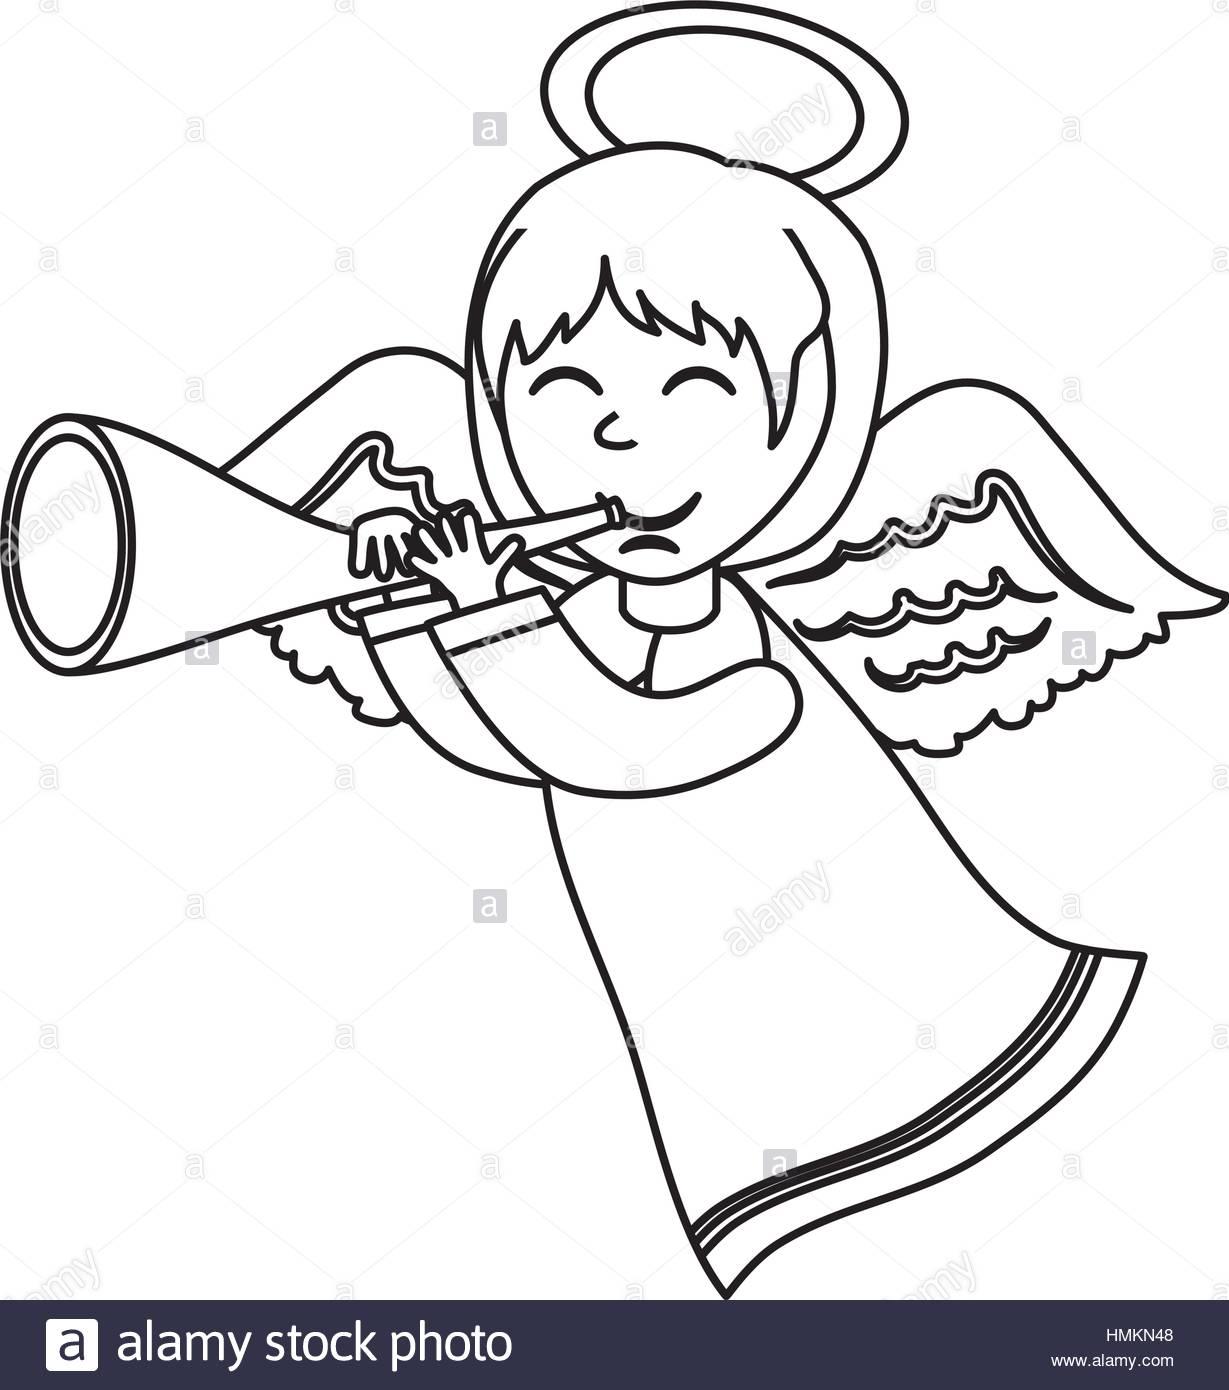 1229x1390 Cute Angel Cartoon Icon Vector Illustration Graphic Design Stock